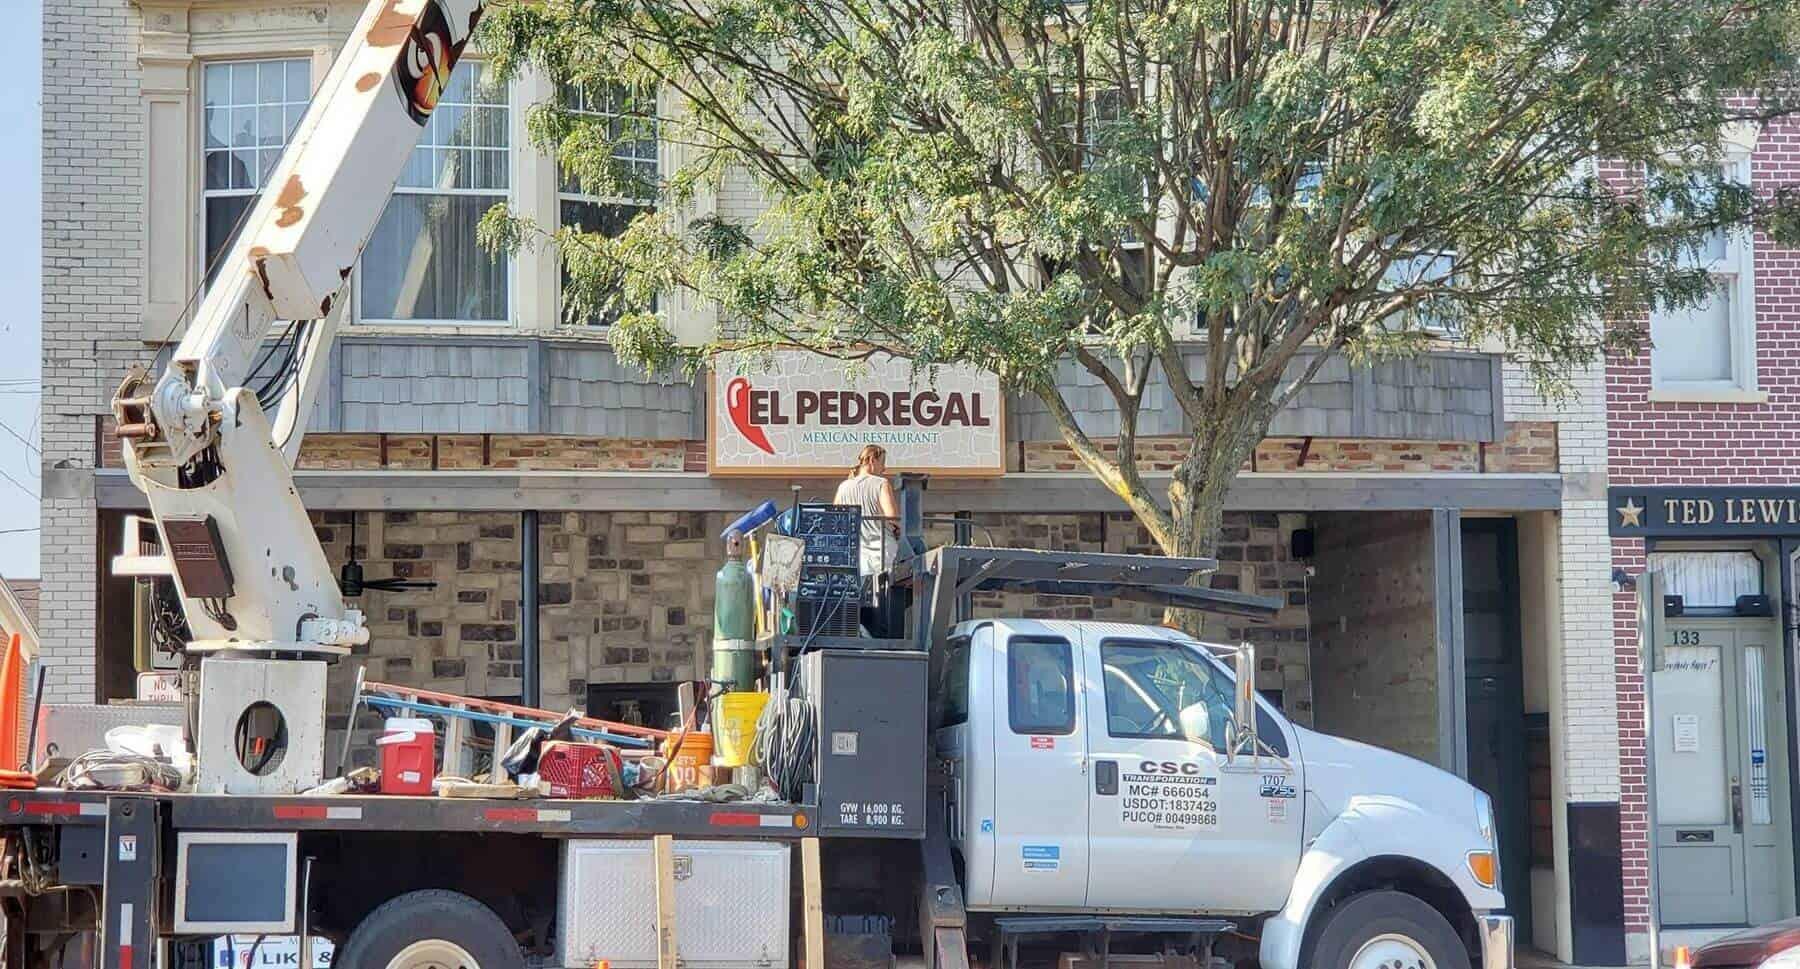 El Pedregal gets new outdoor sign installed